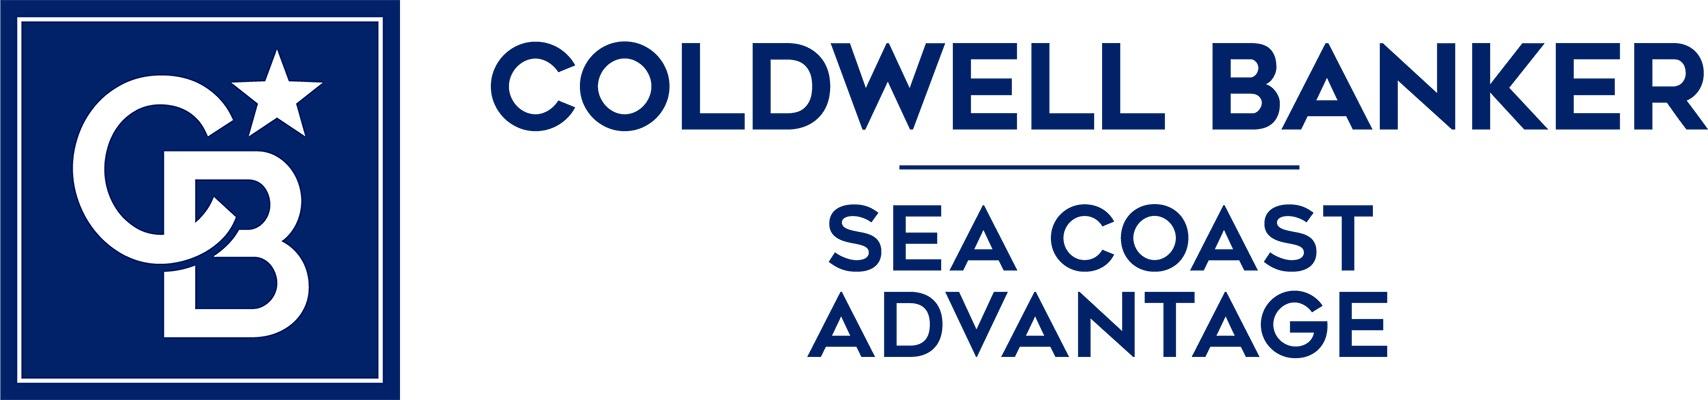 Karen Gaspar - Coldwell Banker Sea Coast Advantage Realty Logo